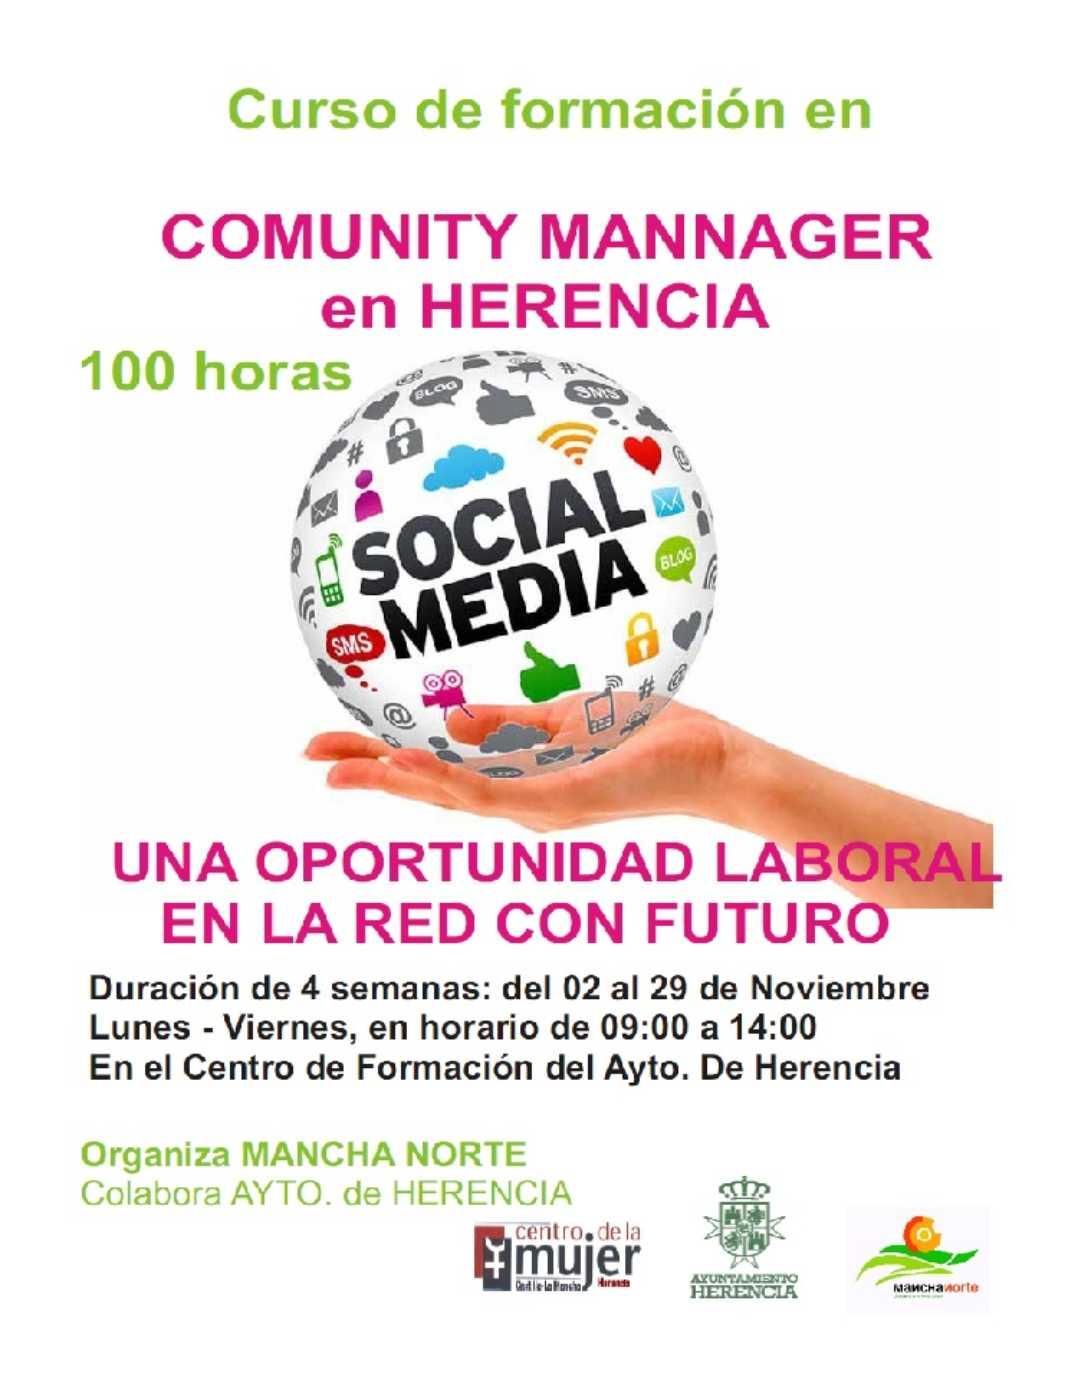 Curso Comunity Mannager 1068x1373 - Mancha Norte organiza un curso de Community Manager en Herencia